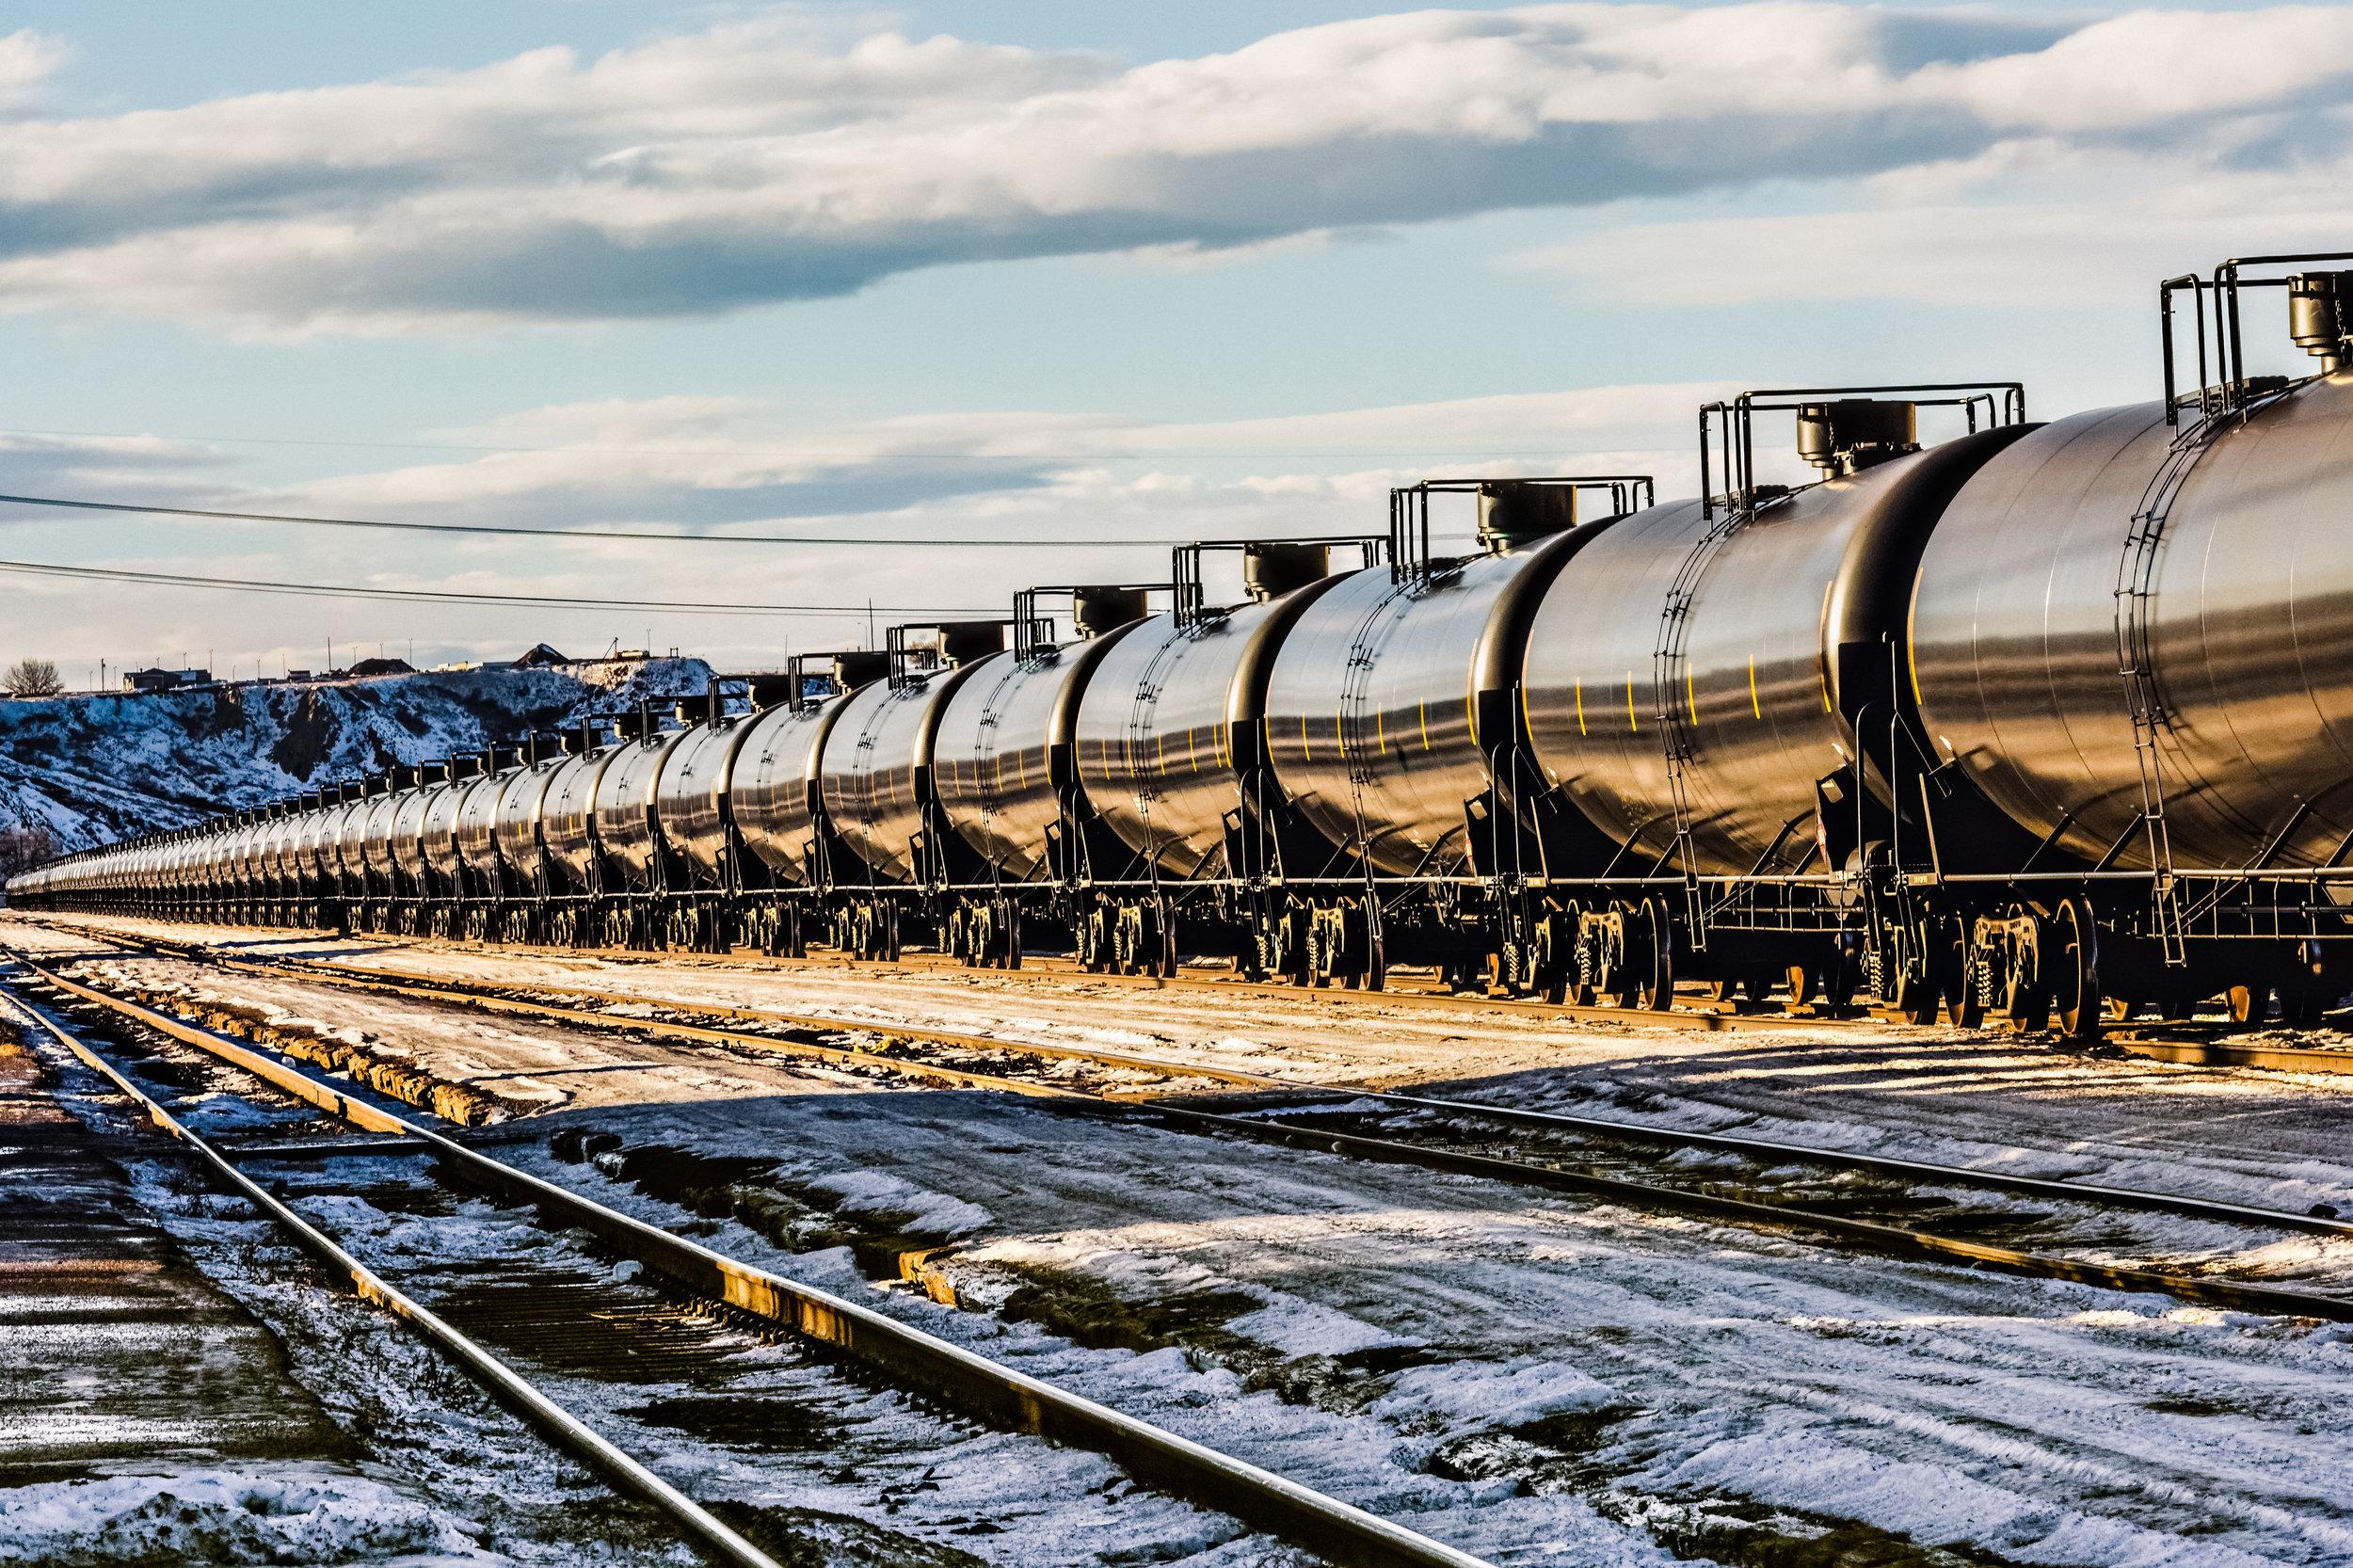 Oil-train-passing-through-a-Montana-railyard-from-North-Dakota-494906828_3869x2579.jpeg